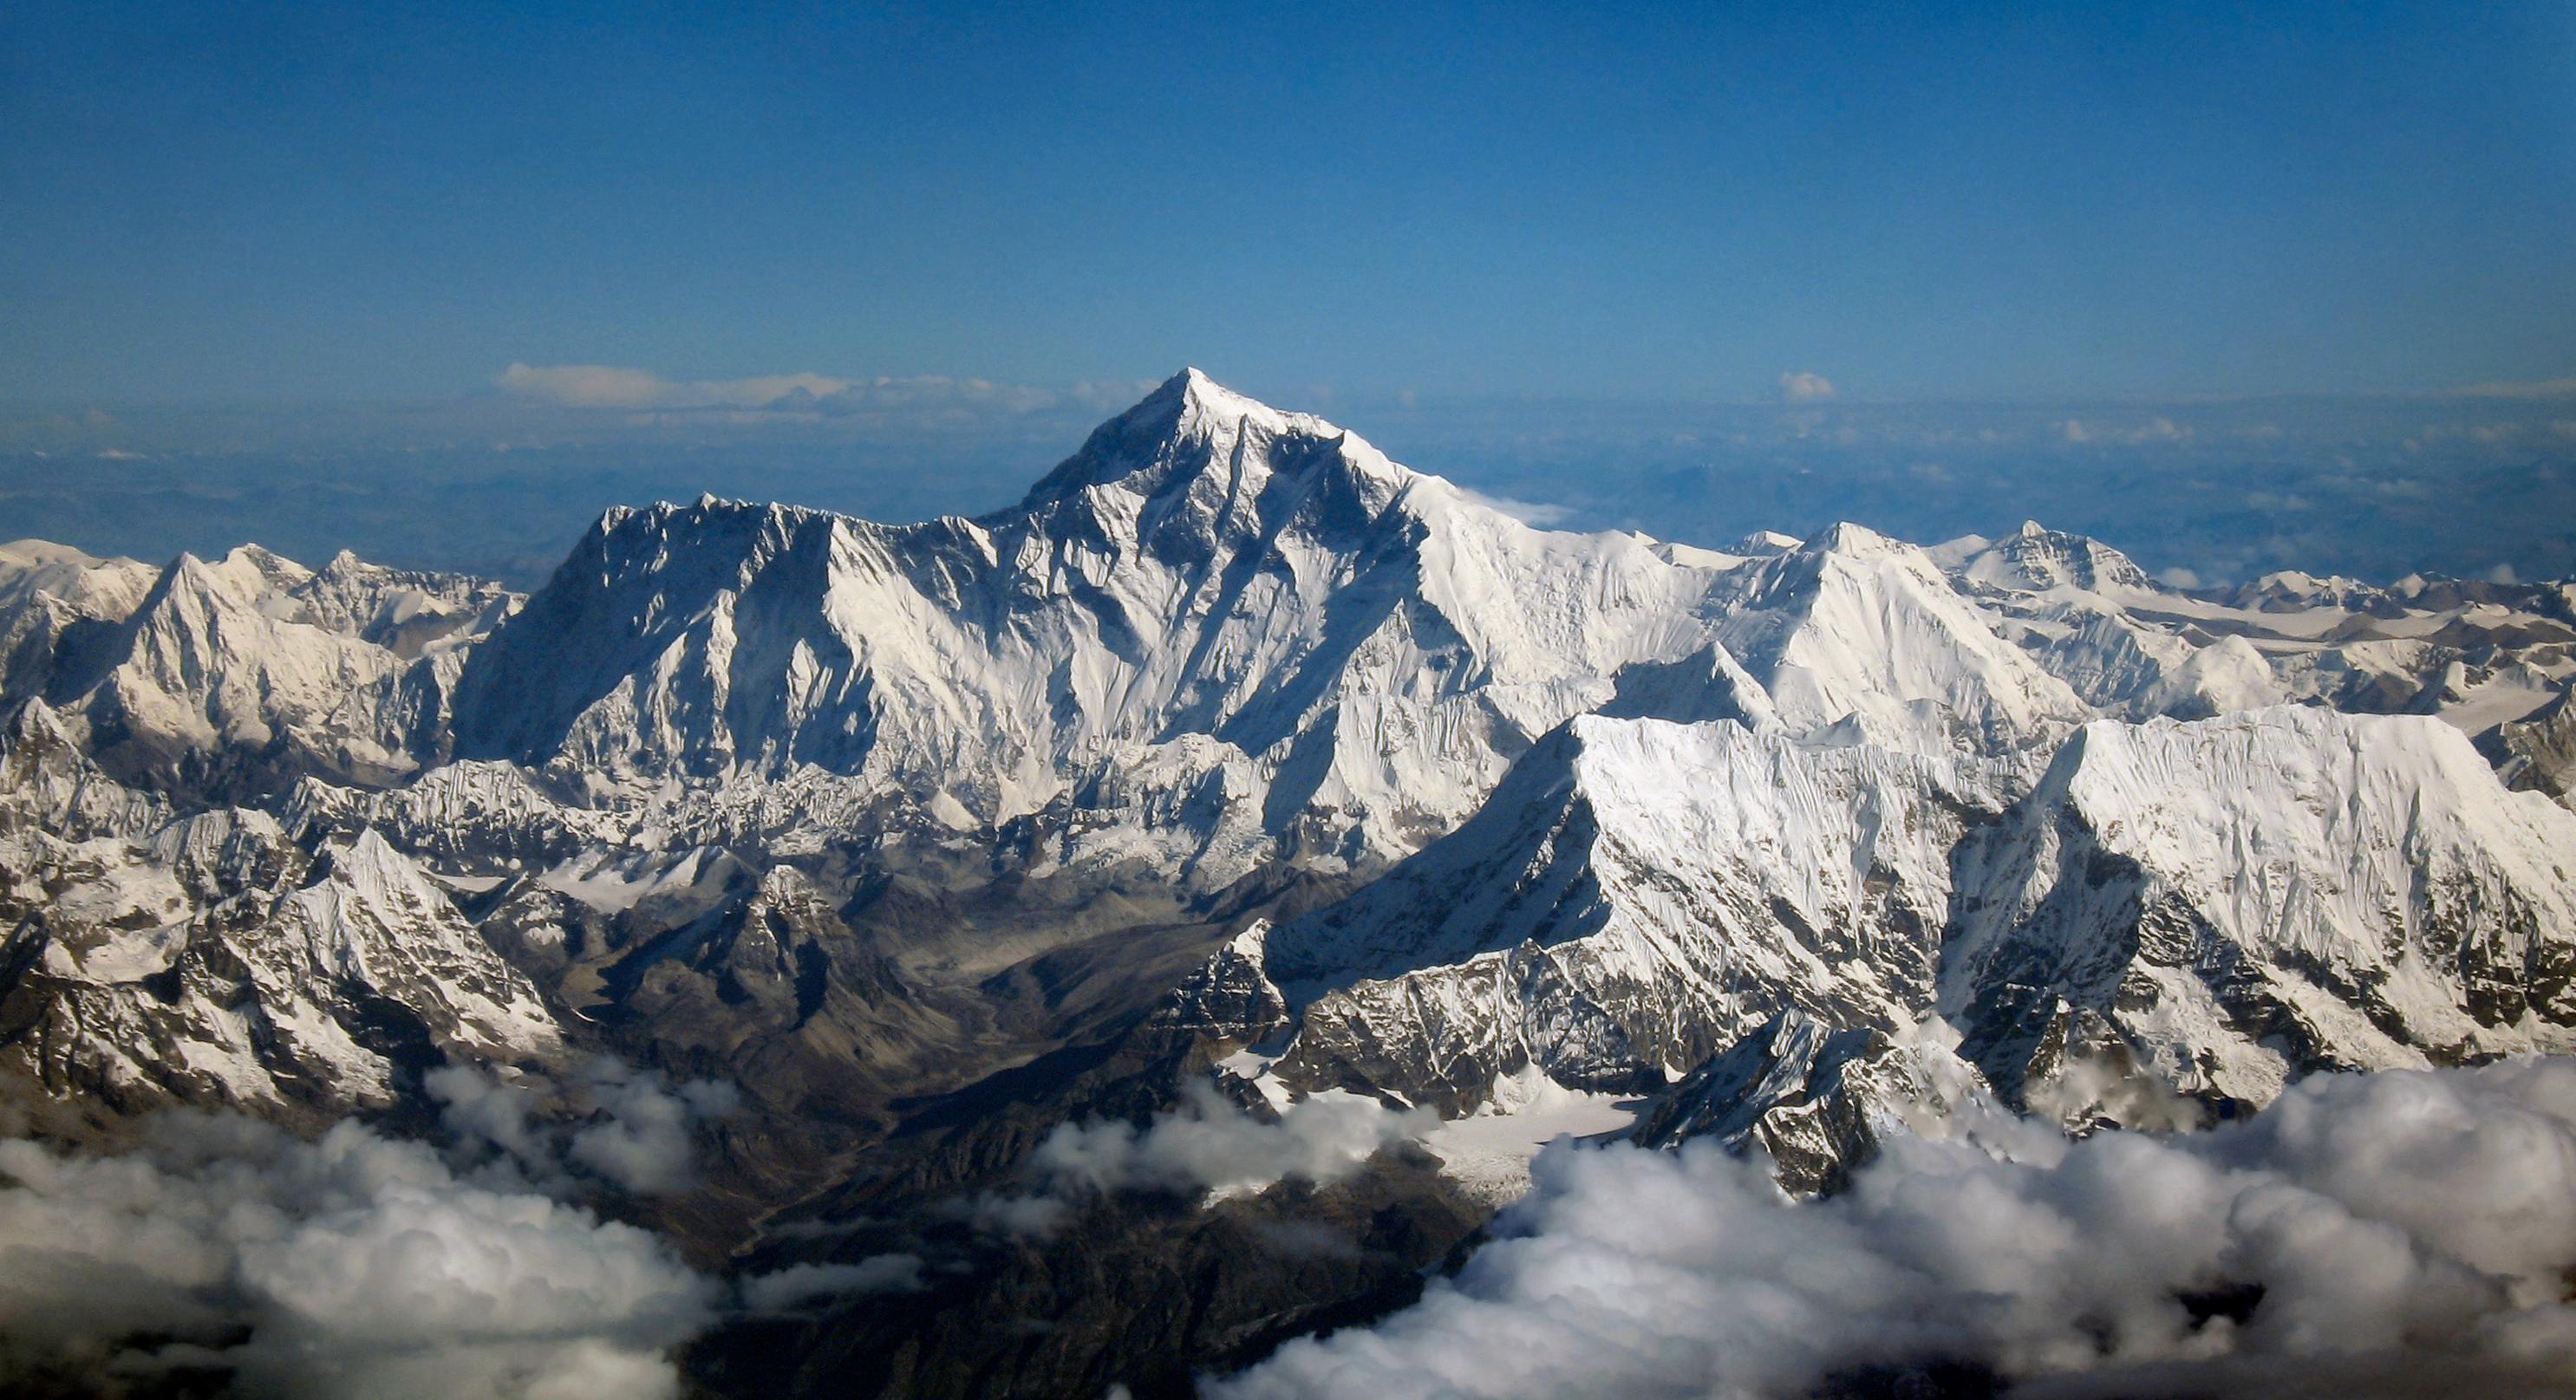 Everest зурган илэрцүүд